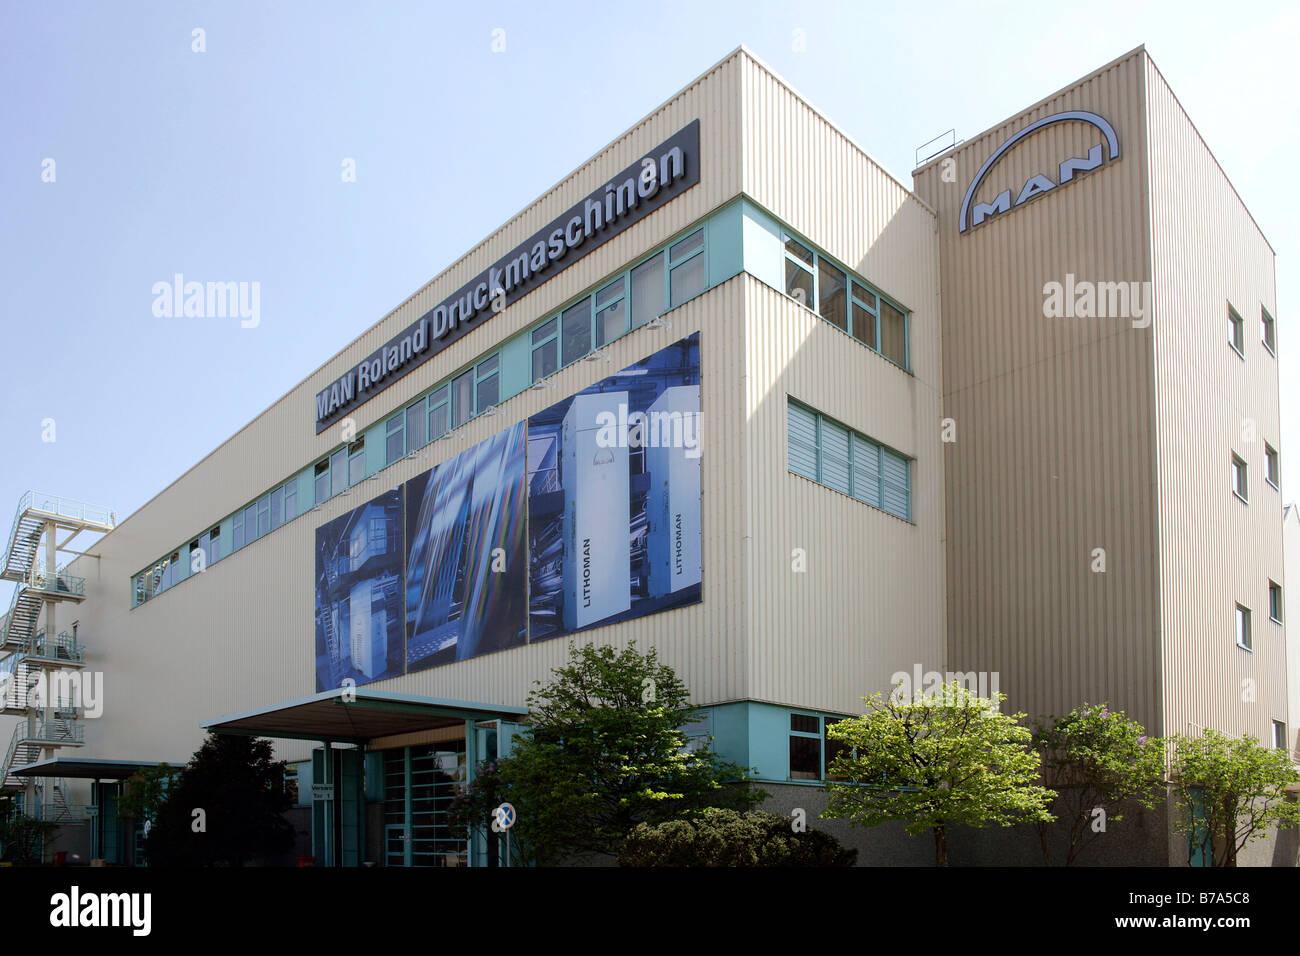 Production hall, manufacture, Production MAN Roland Printing Machine Corporation, Augsburg, Bavaria, Germany, Europe - Stock Image